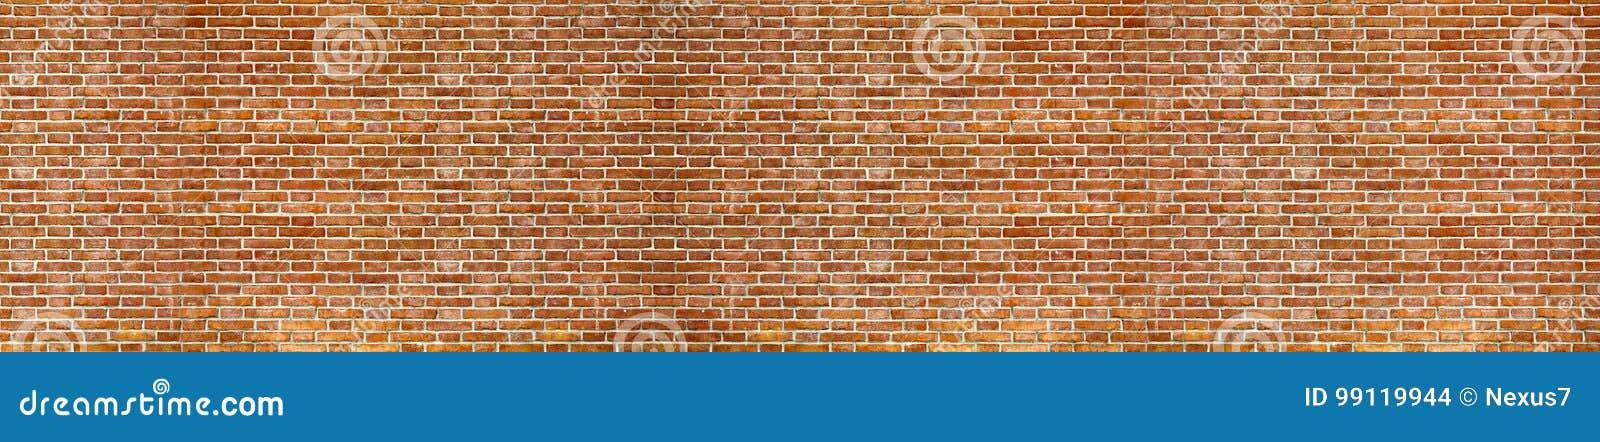 стена текстуры красного цвета кирпича